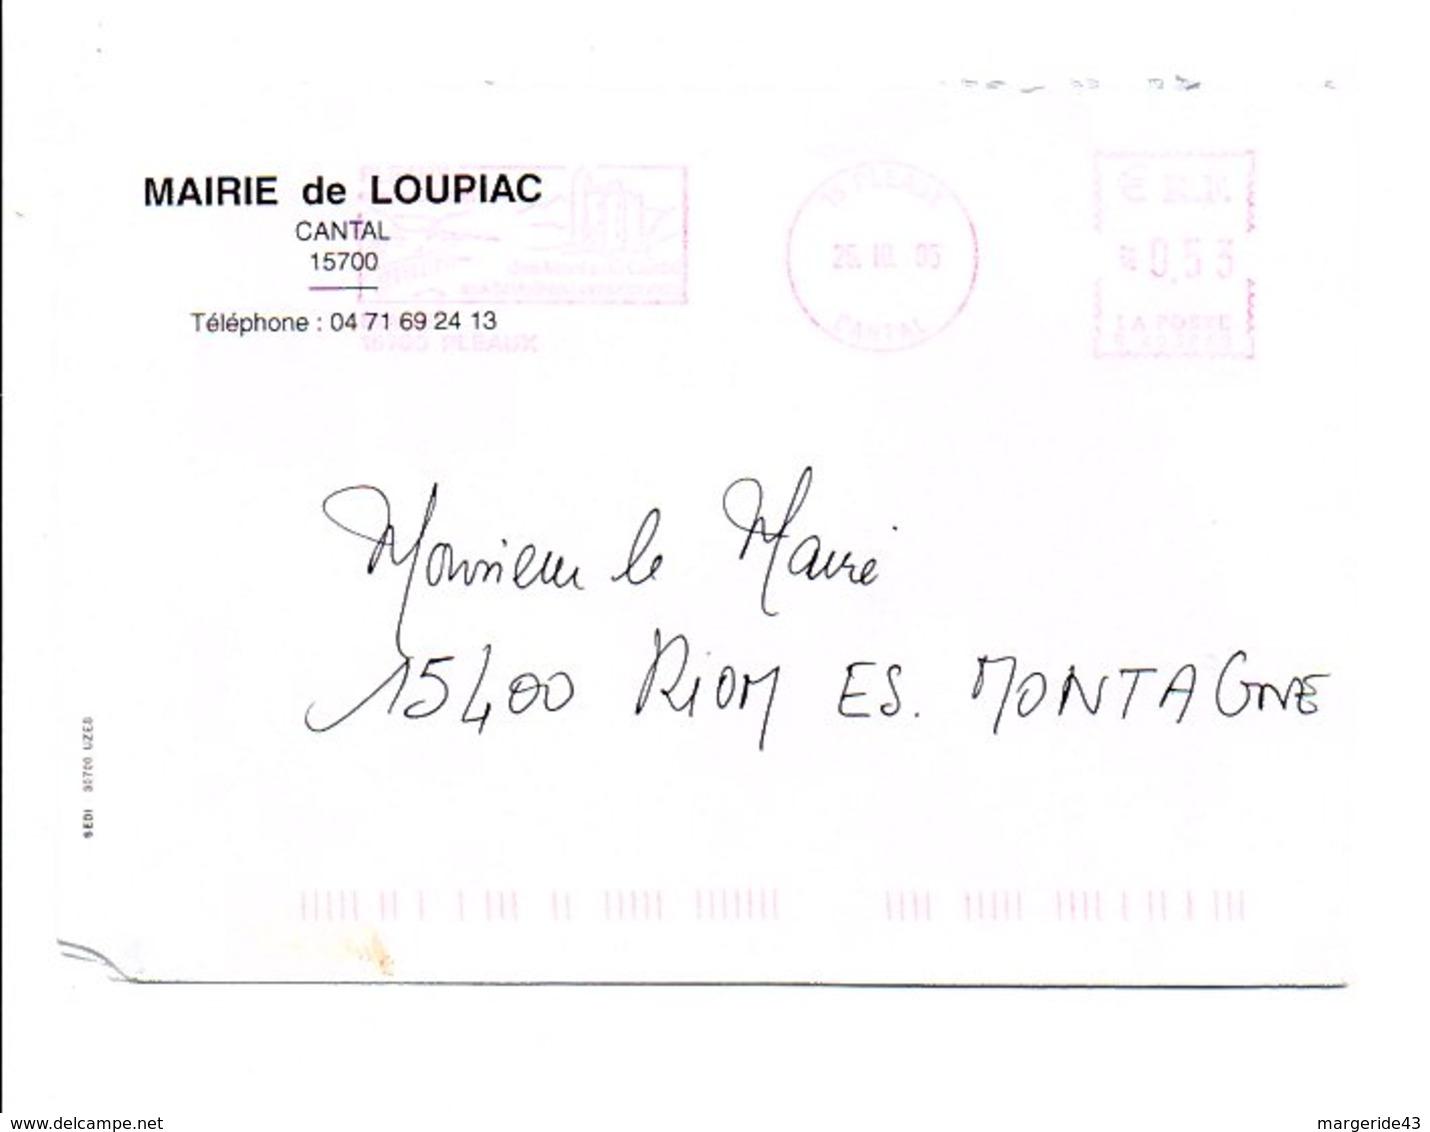 LETTRE DE MAIRIE DE LOUPIAC CANTAL - Postmark Collection (Covers)